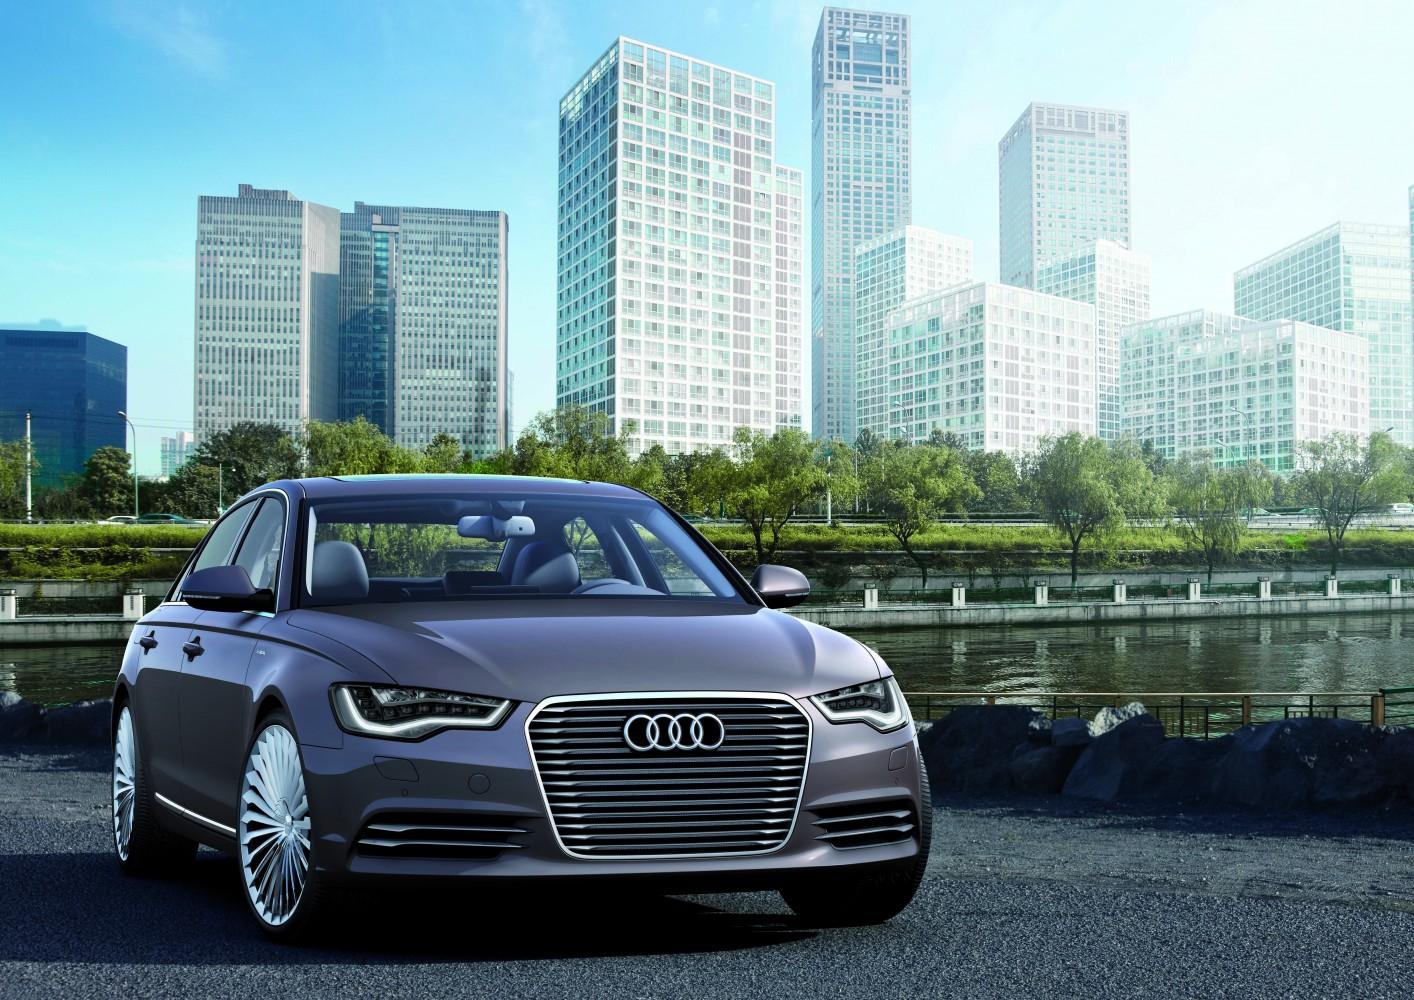 Audi A6 L e-tron concept – Peking 2012